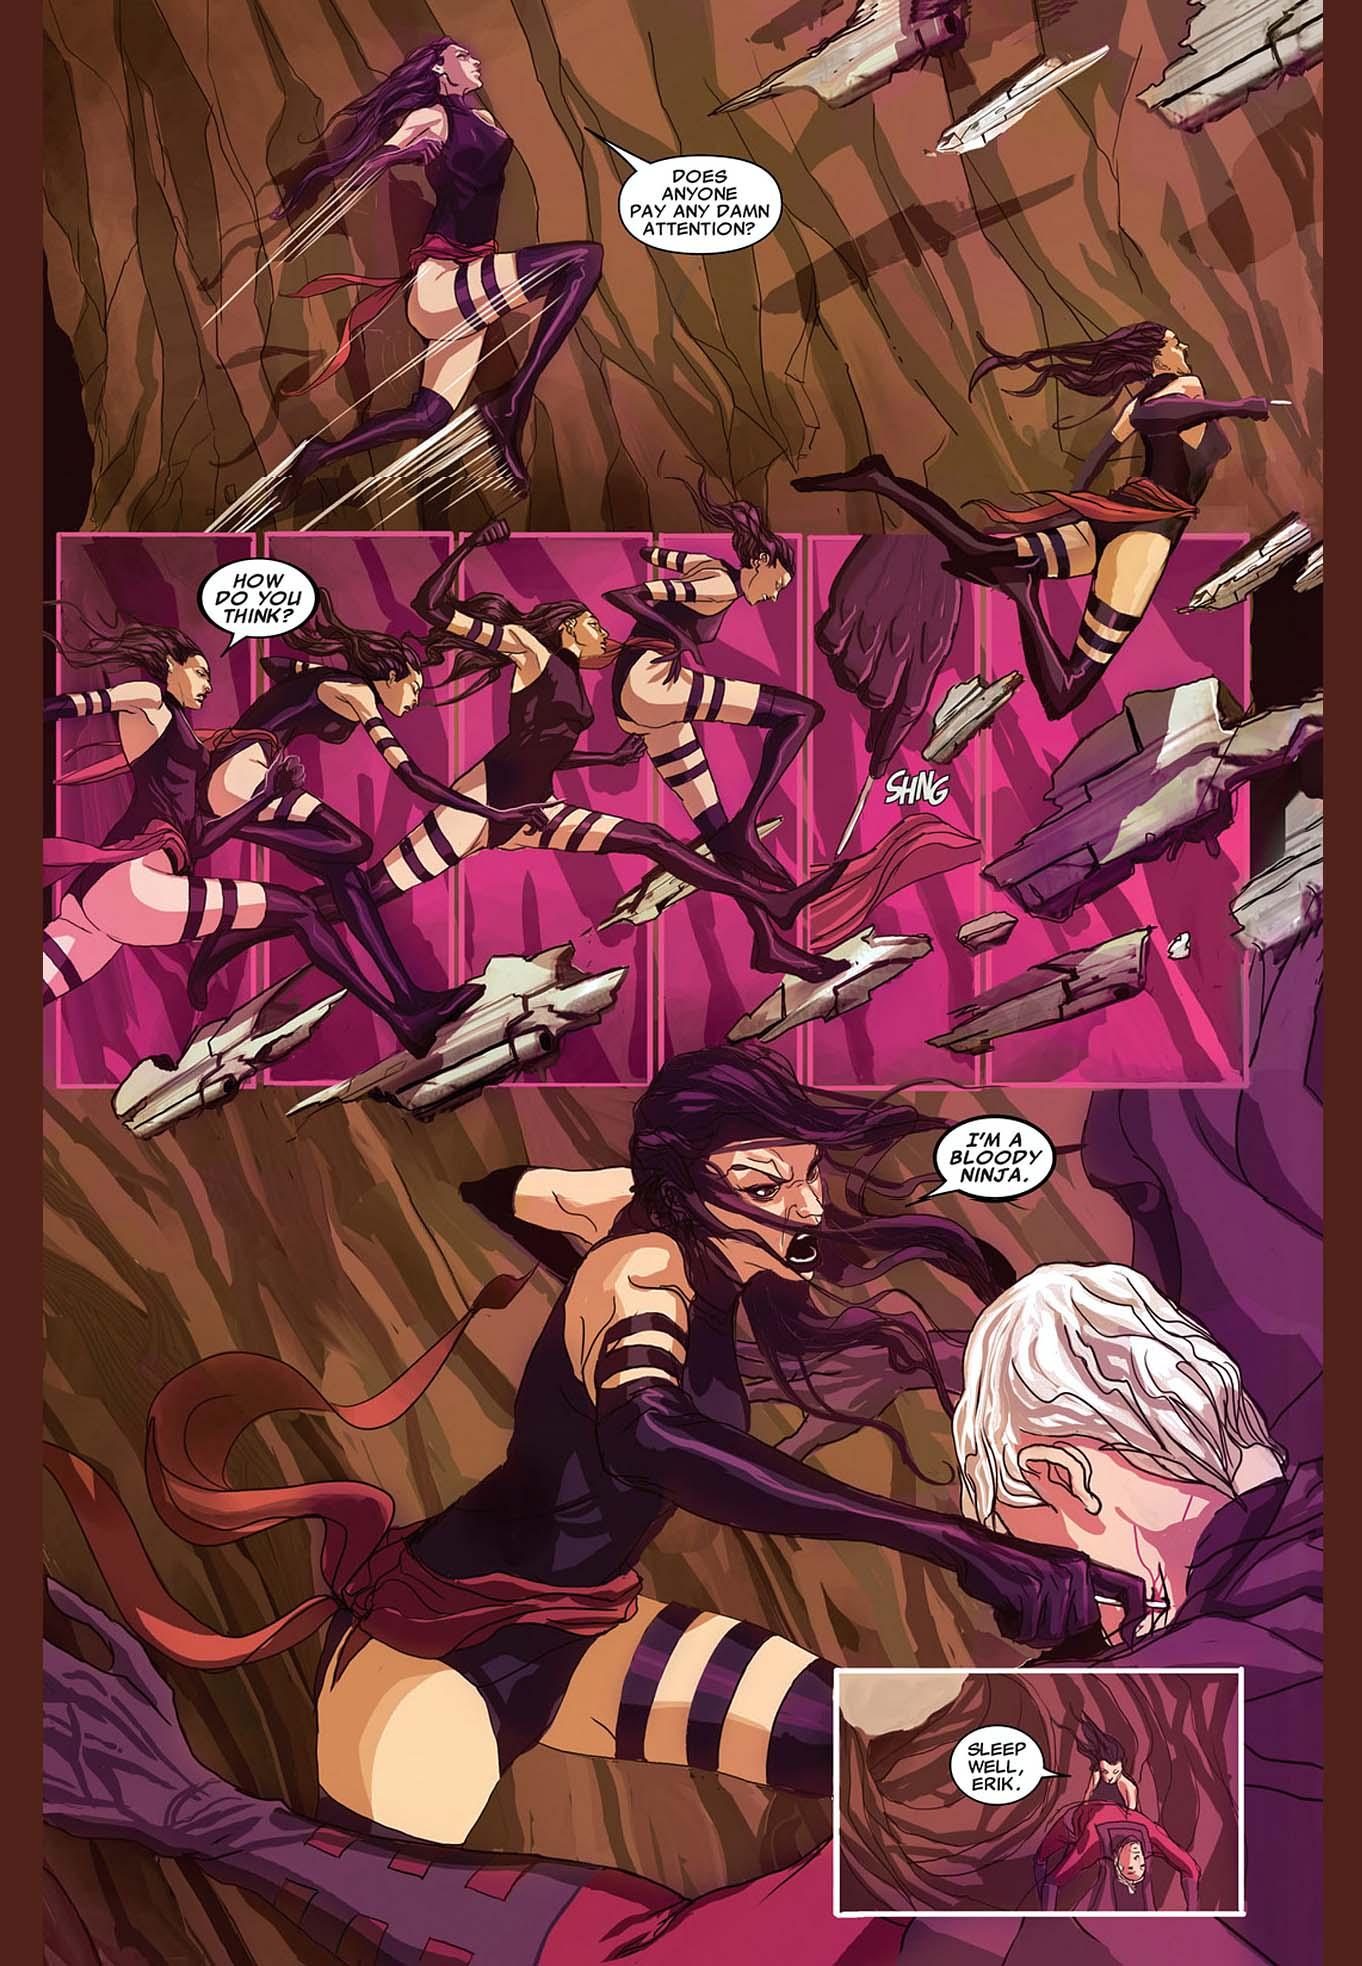 psylocke takes out magneto 2